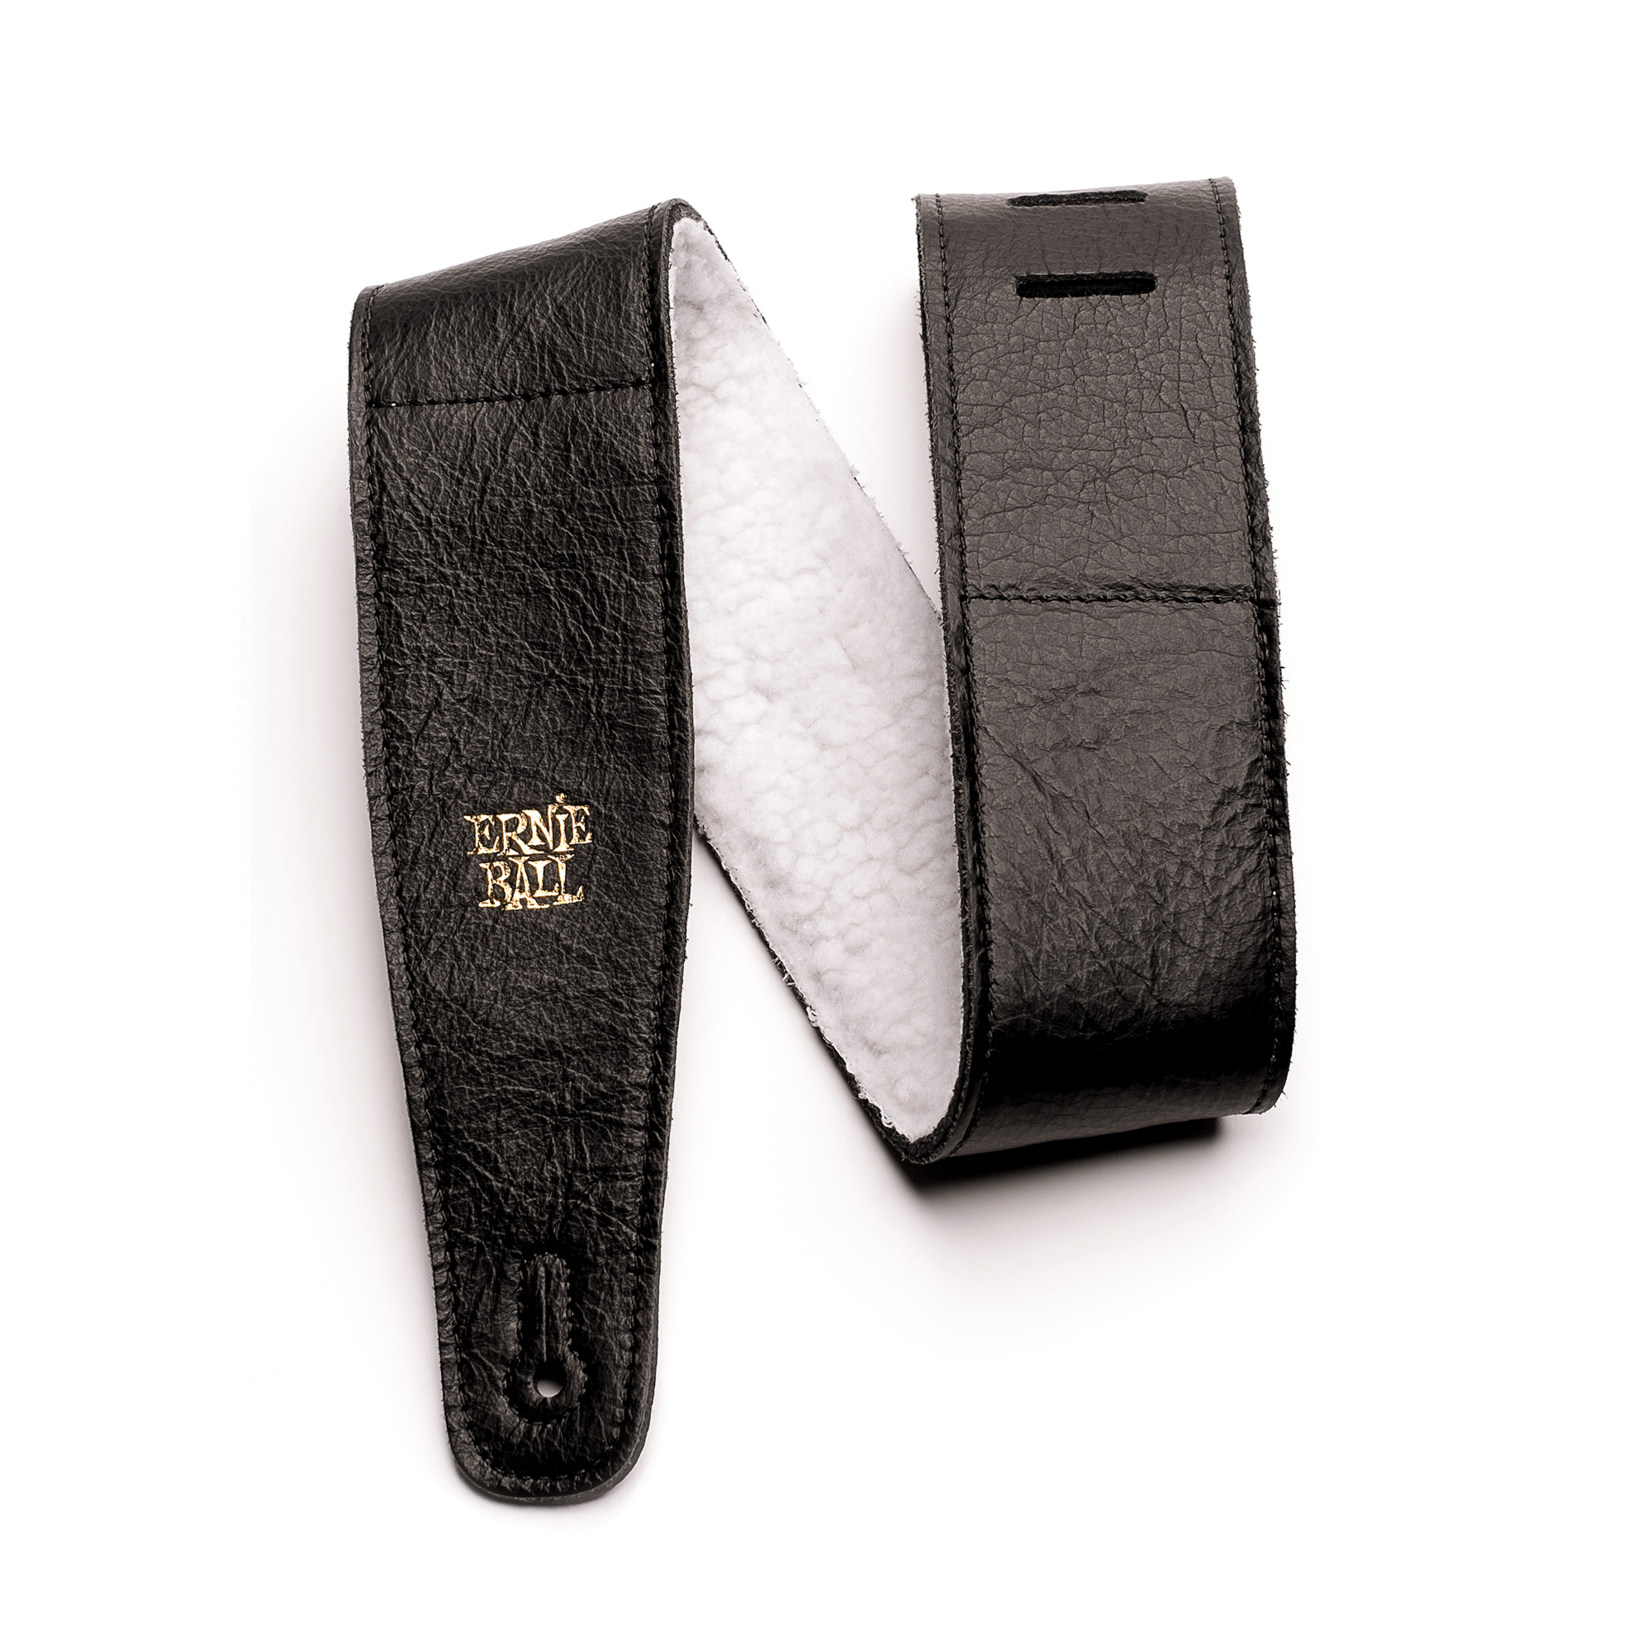 "Ernie Ball Ernie Ball 2.5"" Adjustable Italian Leather Strap with Fur Padding - Black"